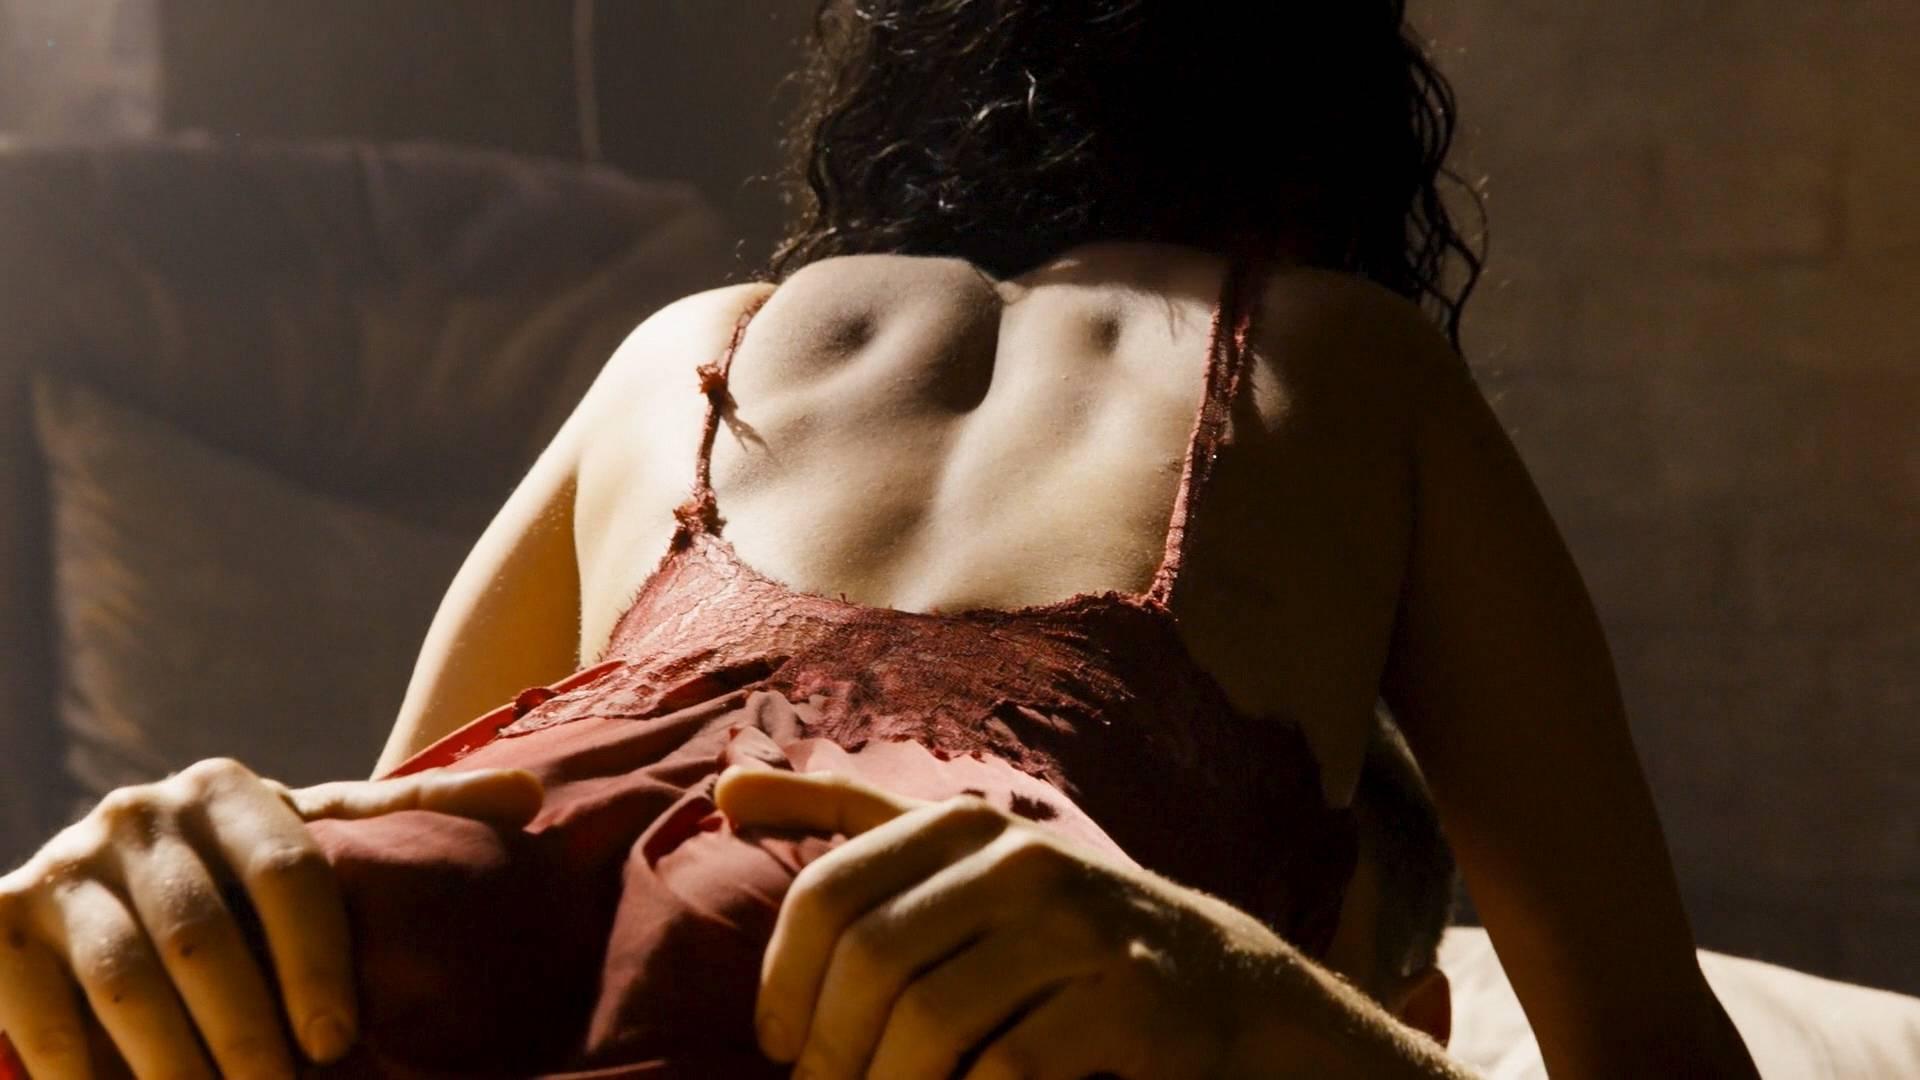 Tina Desai Nude, Fappening, Sexy Photos, Uncensored